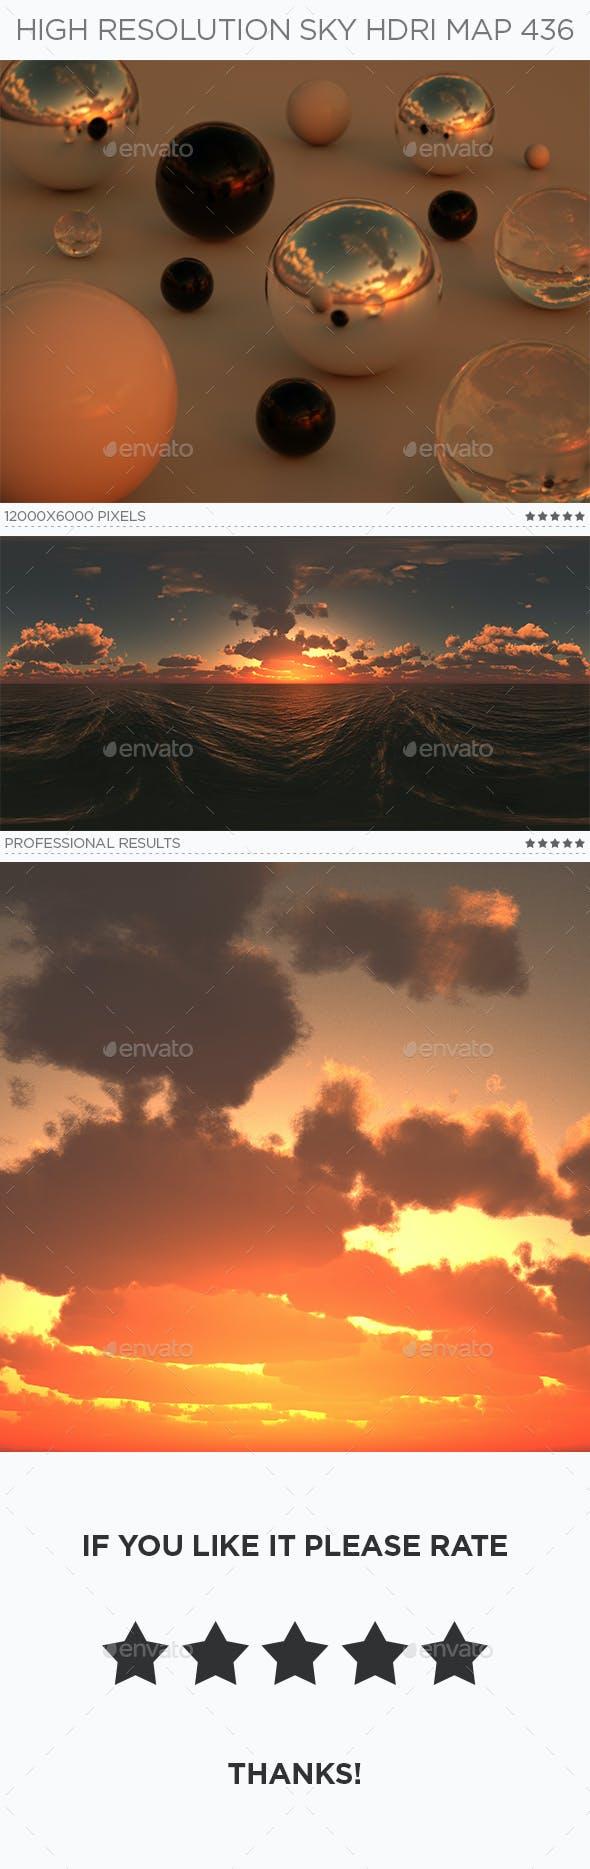 High Resolution Sky HDRi Map 436 - 3DOcean Item for Sale